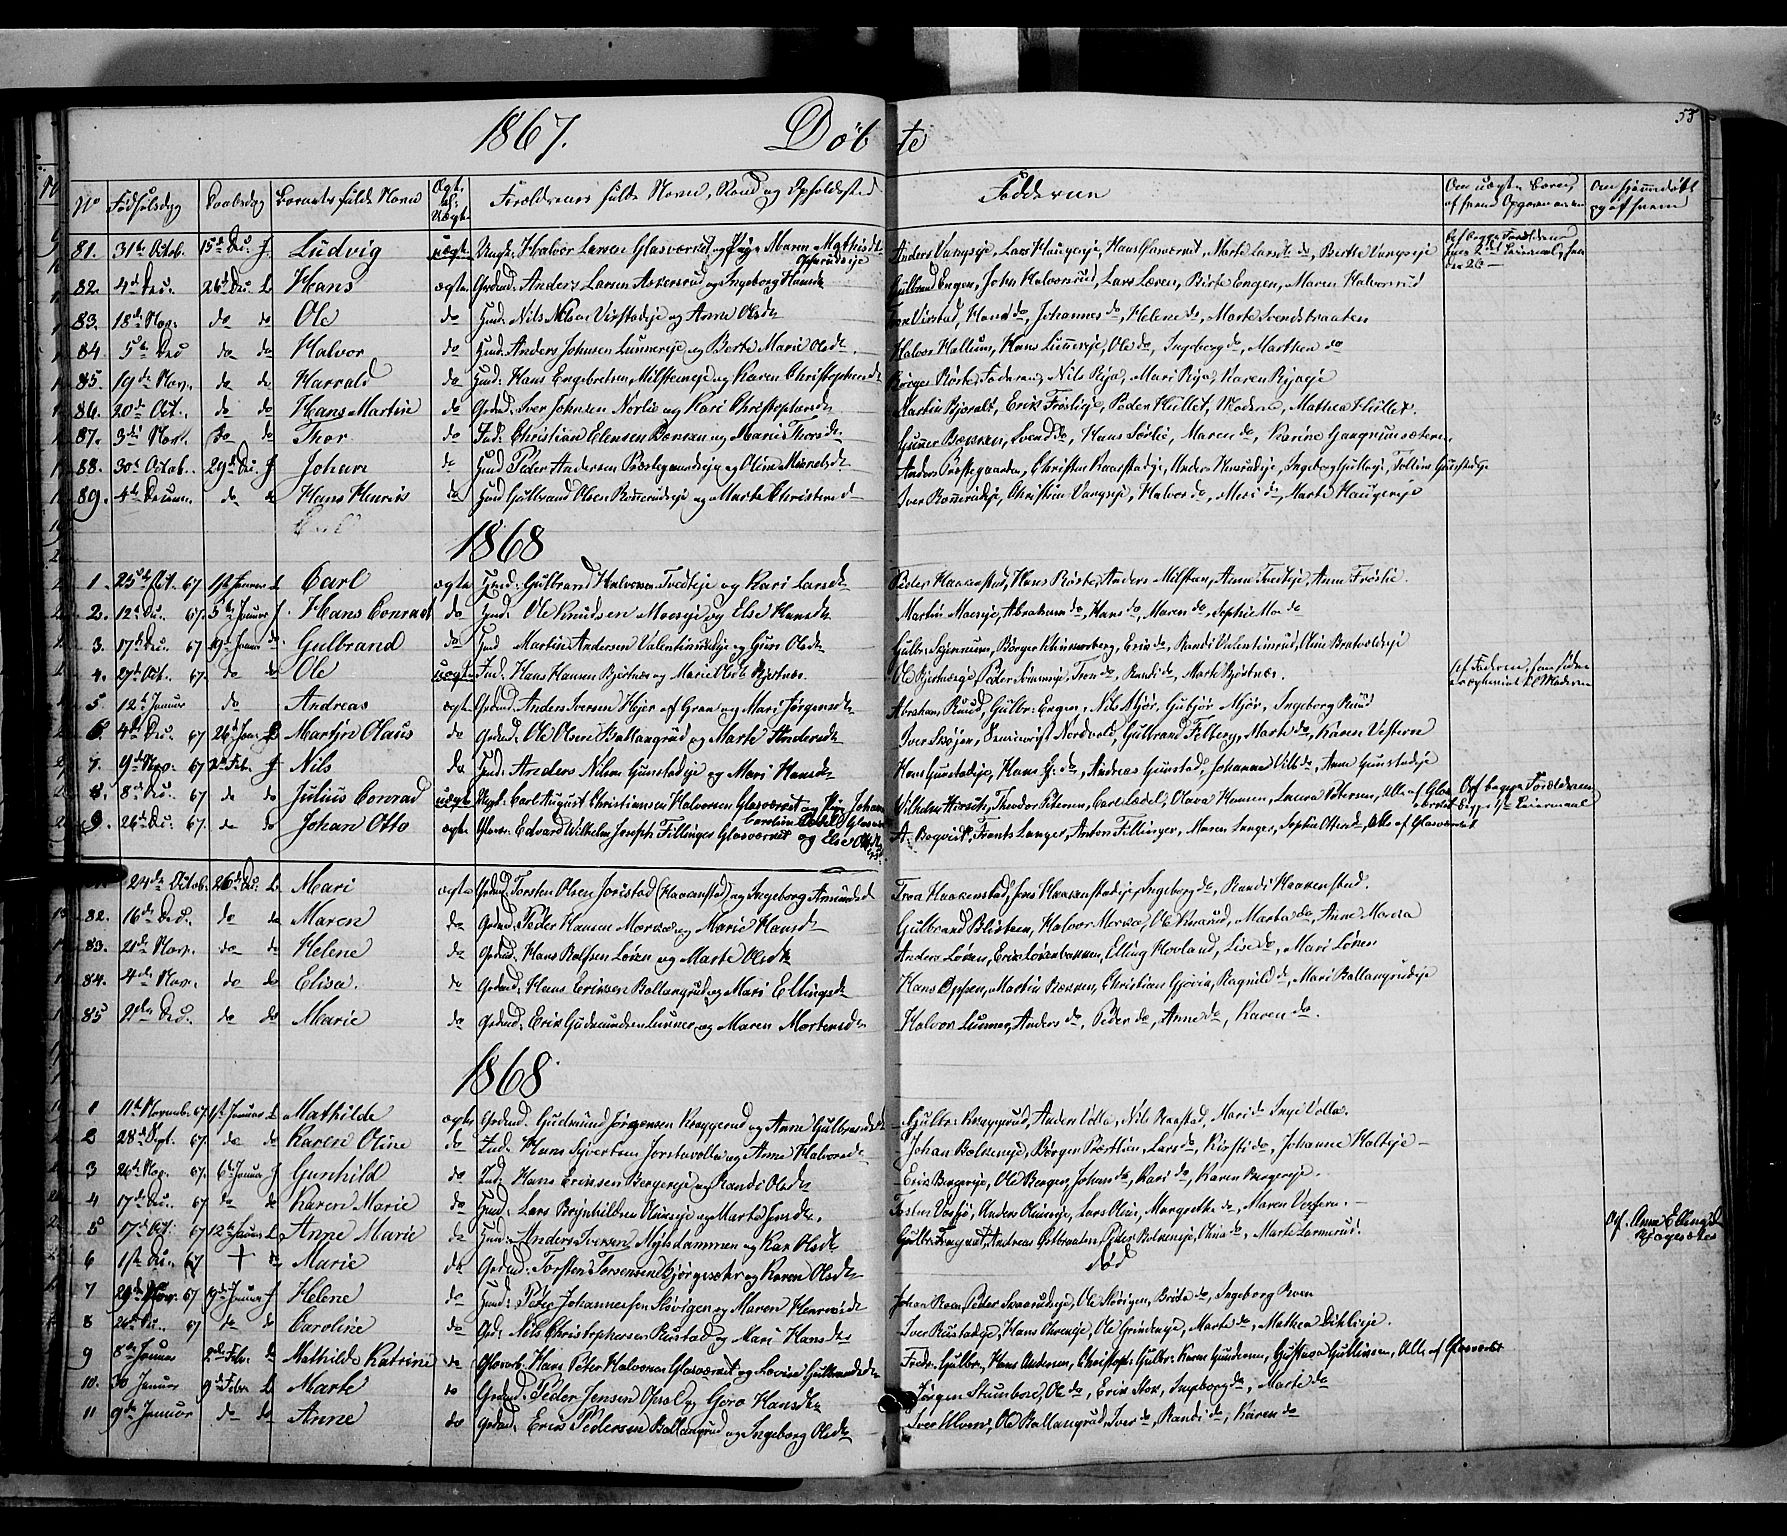 SAH, Jevnaker prestekontor, Ministerialbok nr. 7, 1858-1876, s. 55